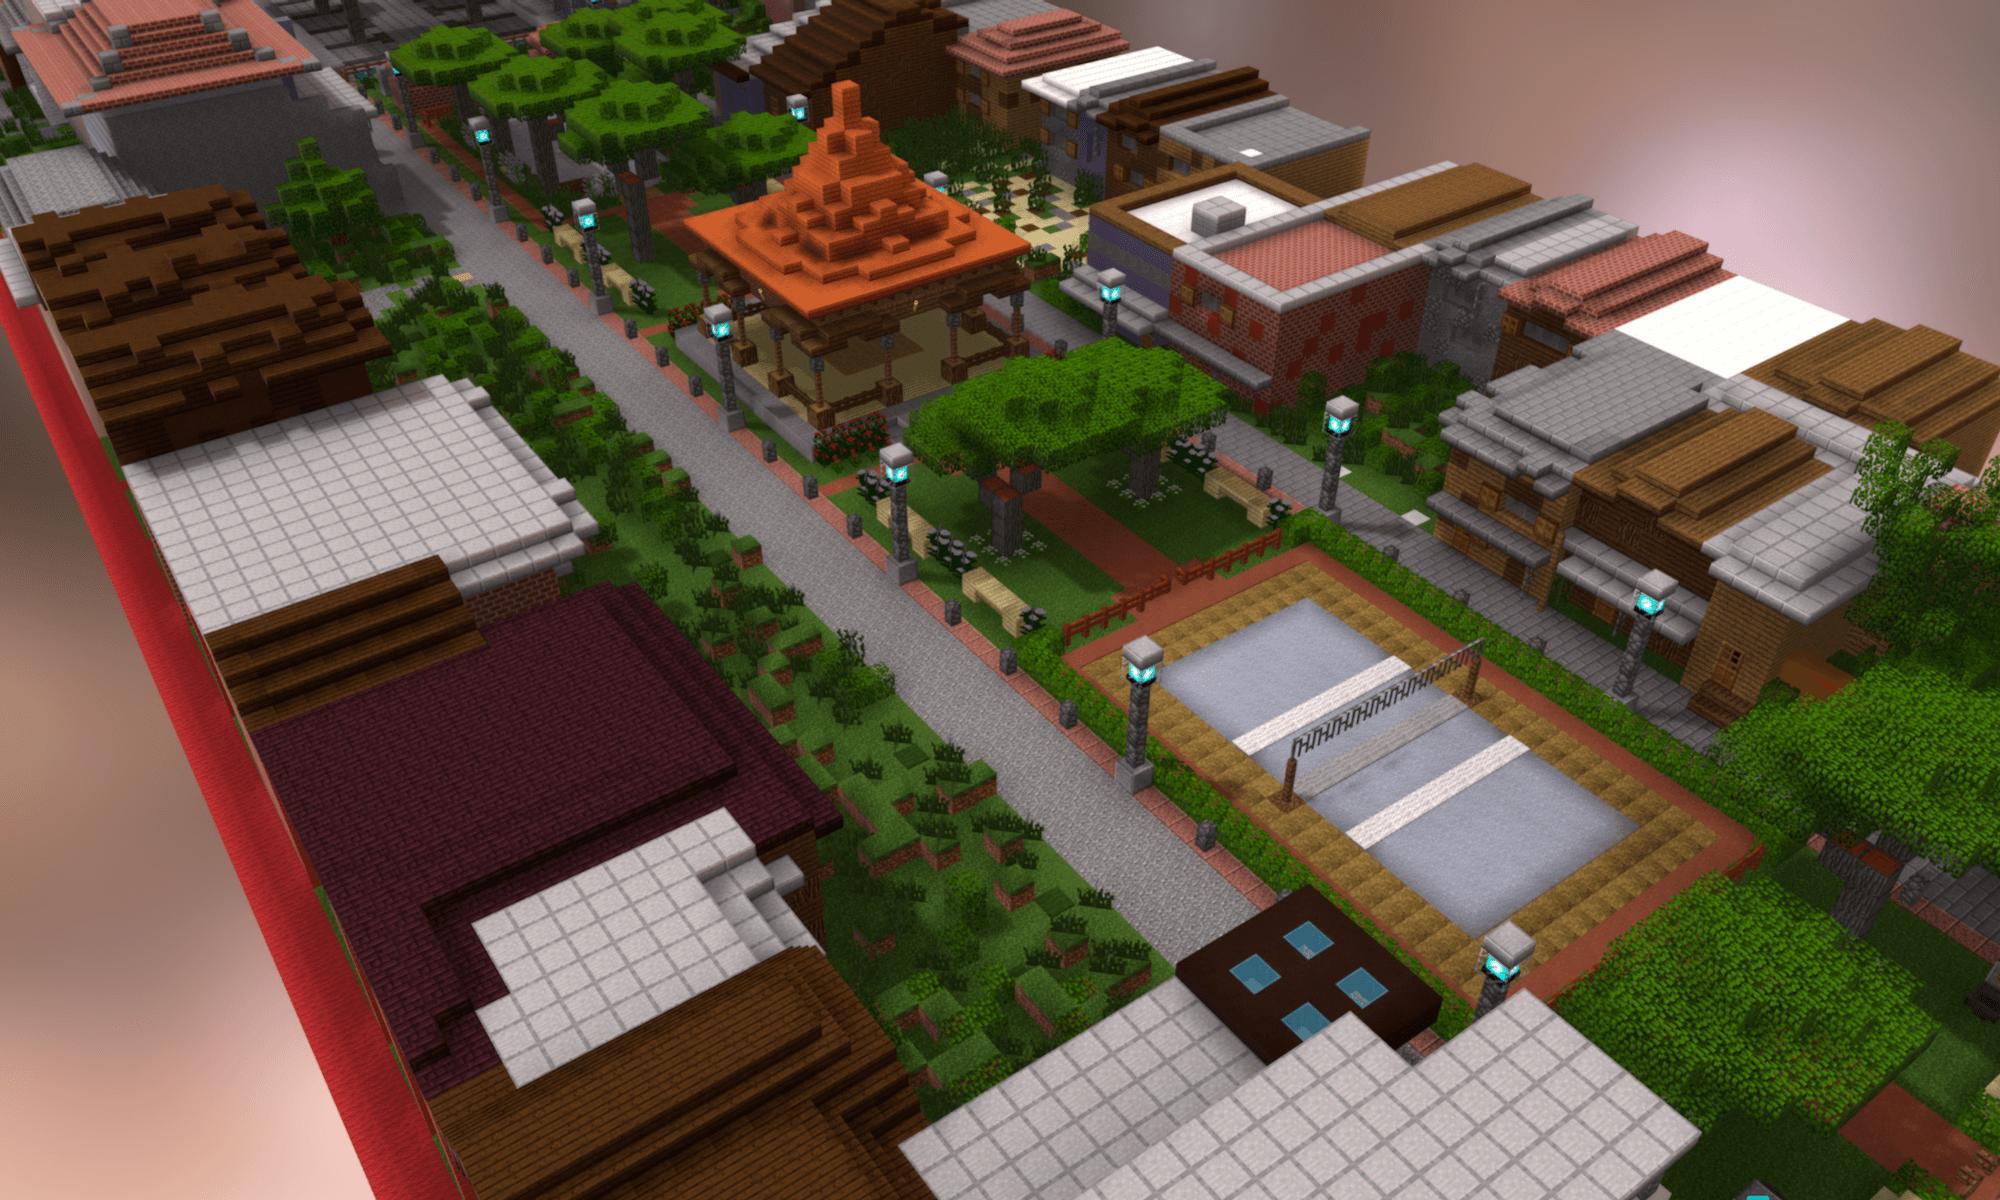 3D Minecraft Model of Community-Designed Public Space in Surabaya, Indonesia